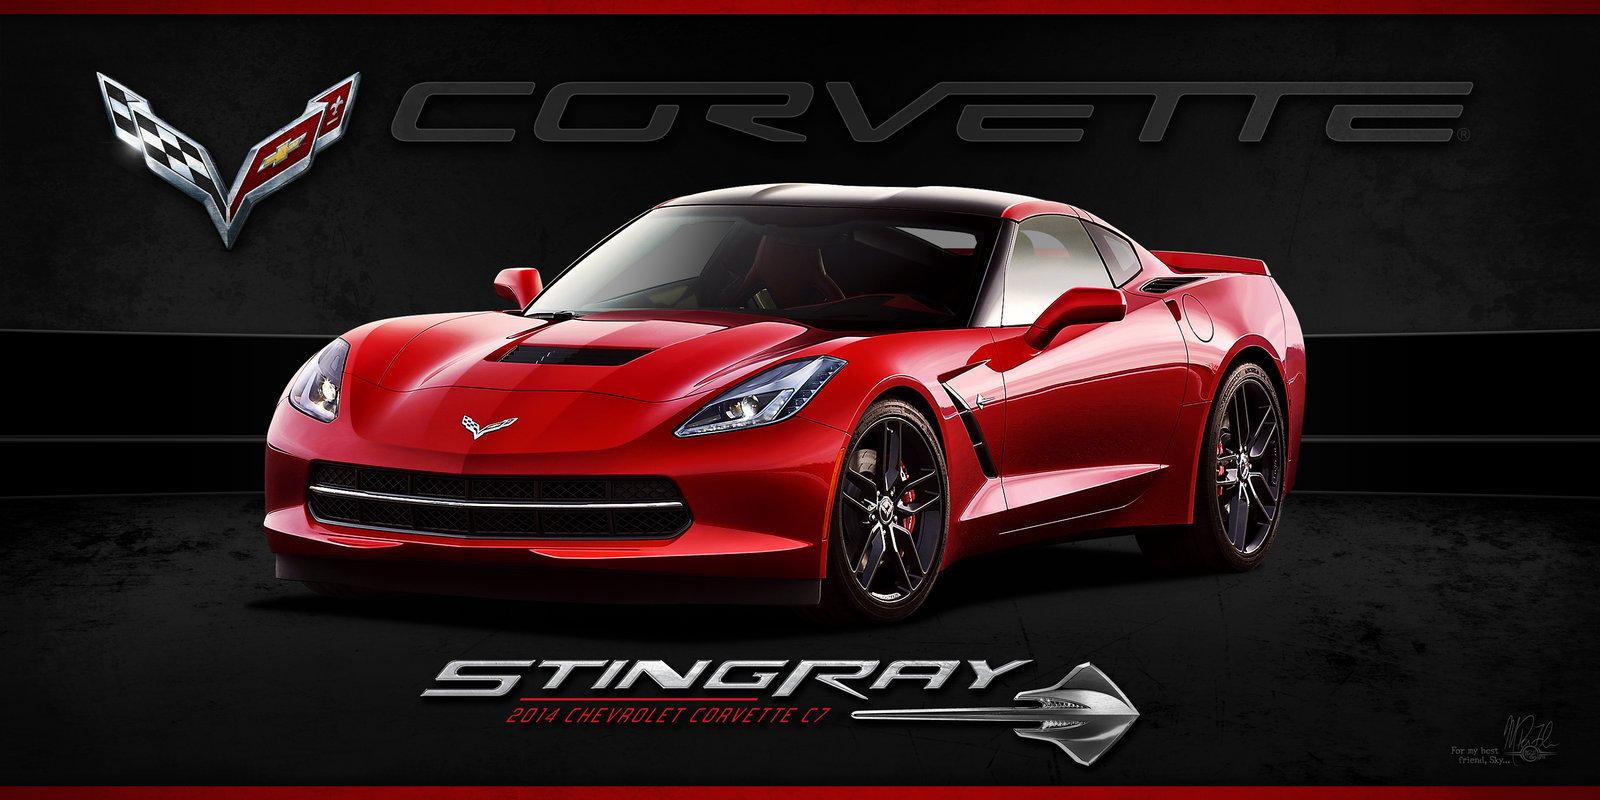 2014 Corvette C7 Stingray by mpfdesign 1600x800